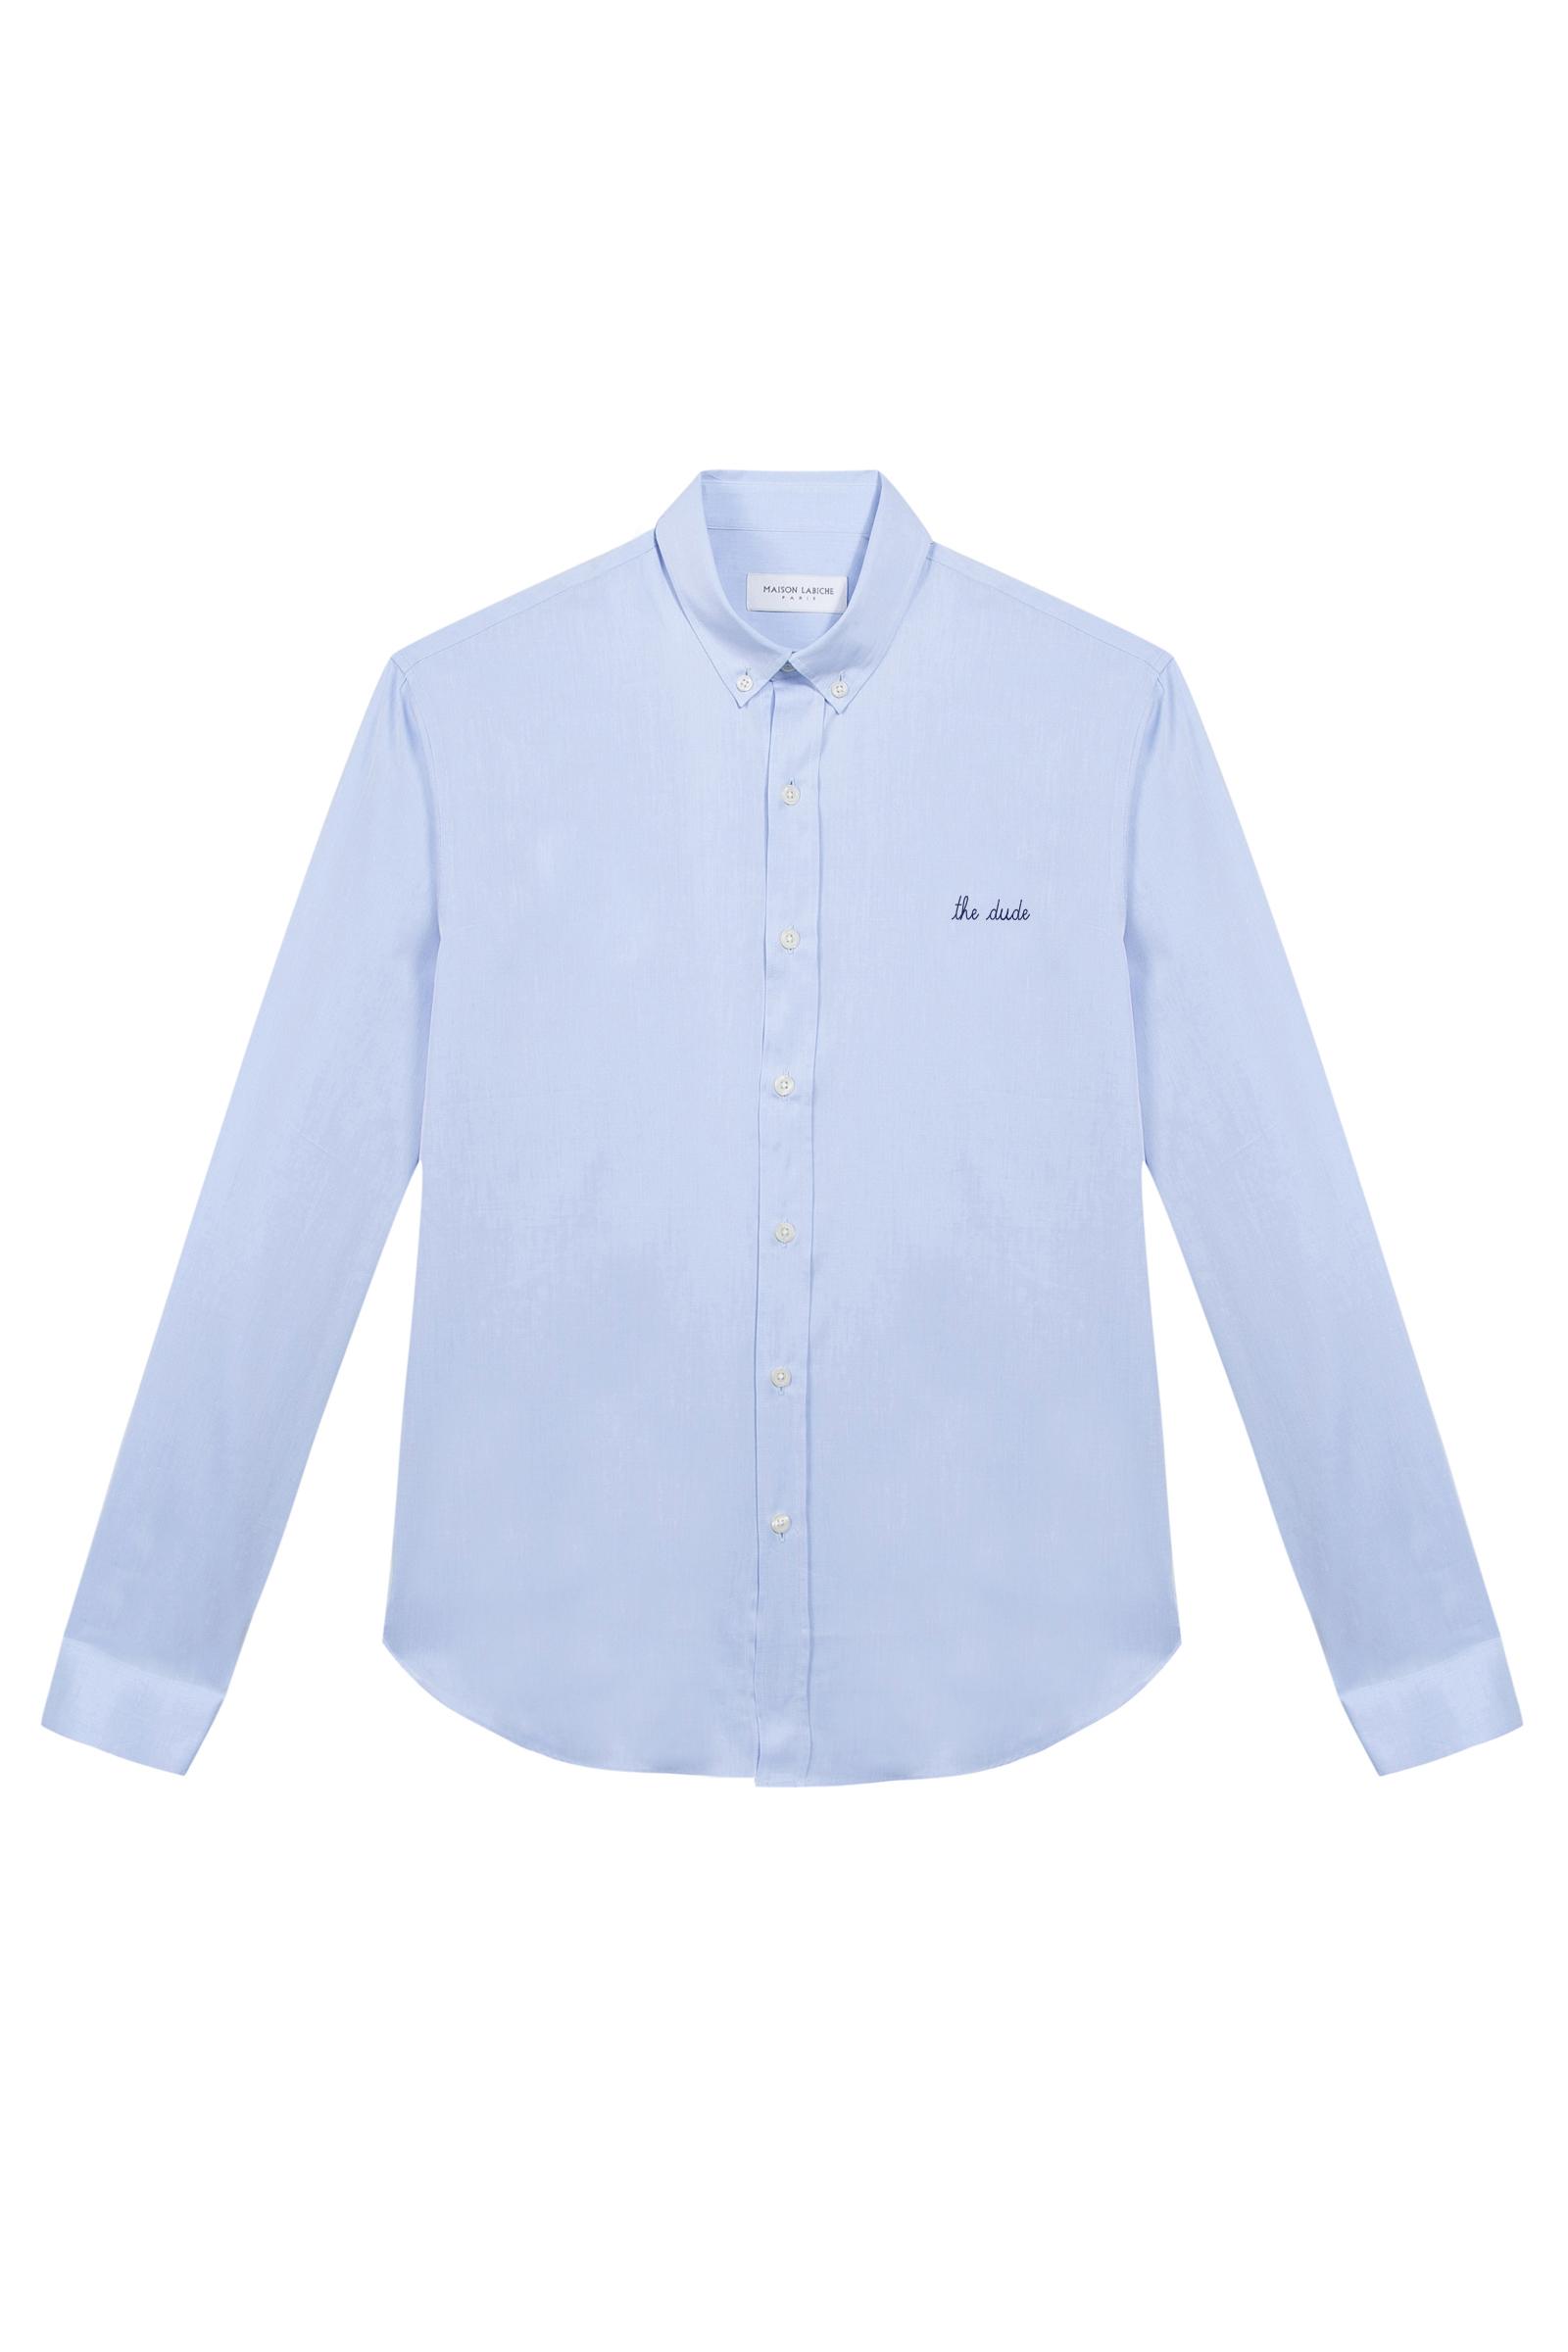 Maison Labiche shirt  - £115